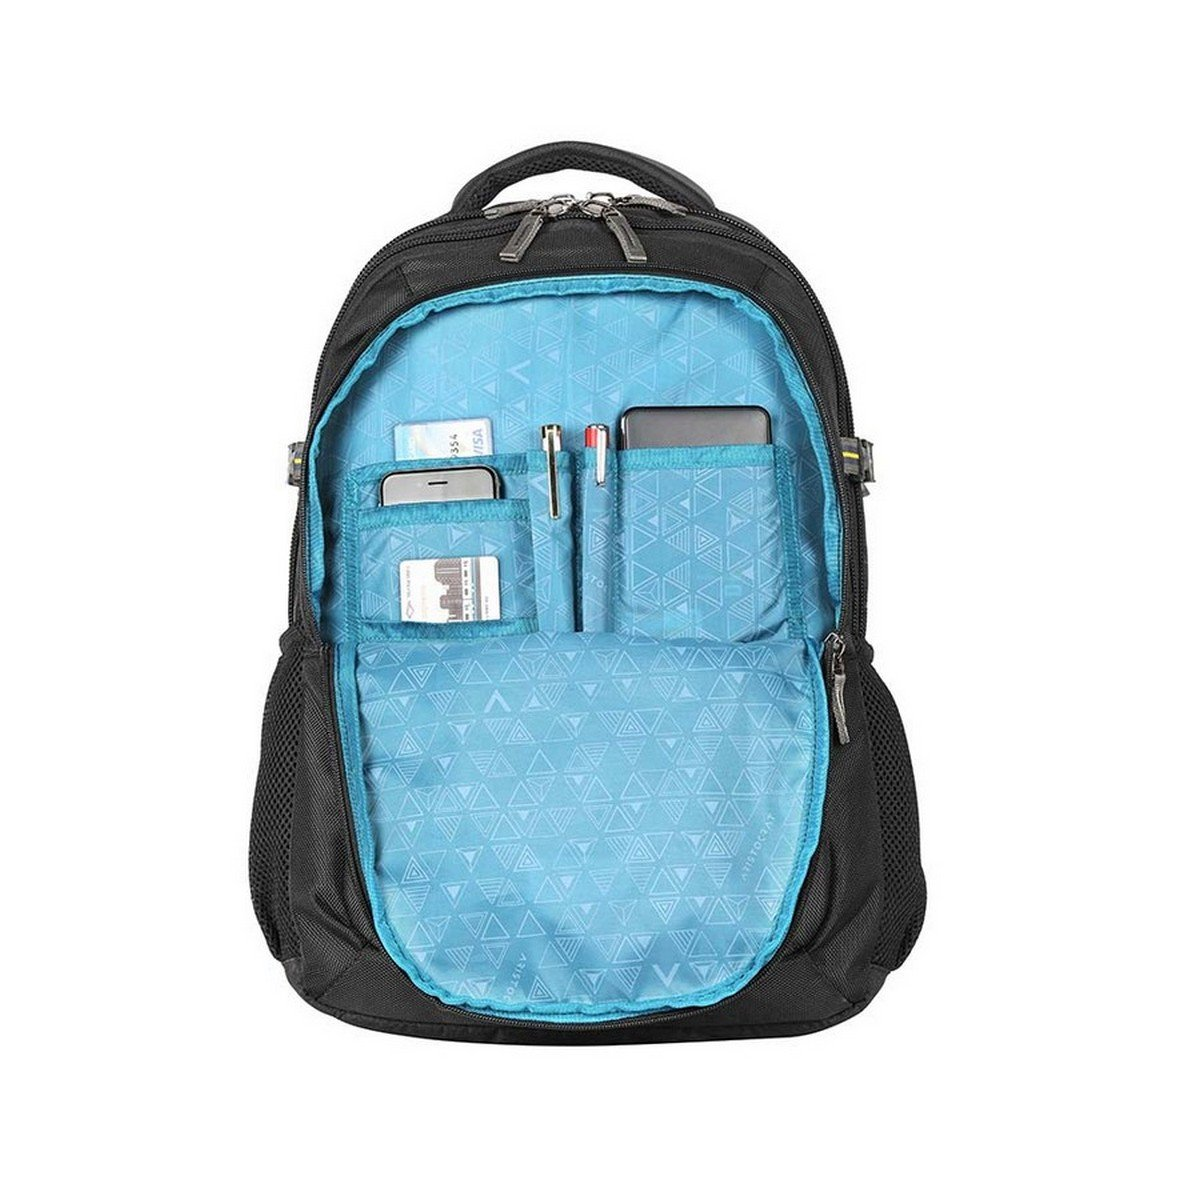 Aristocrat Urban 28 Ltrs Black Laptop Backpack (LPBPURBPBLK)  Amazon.in   Bags 4bd47c69f4894